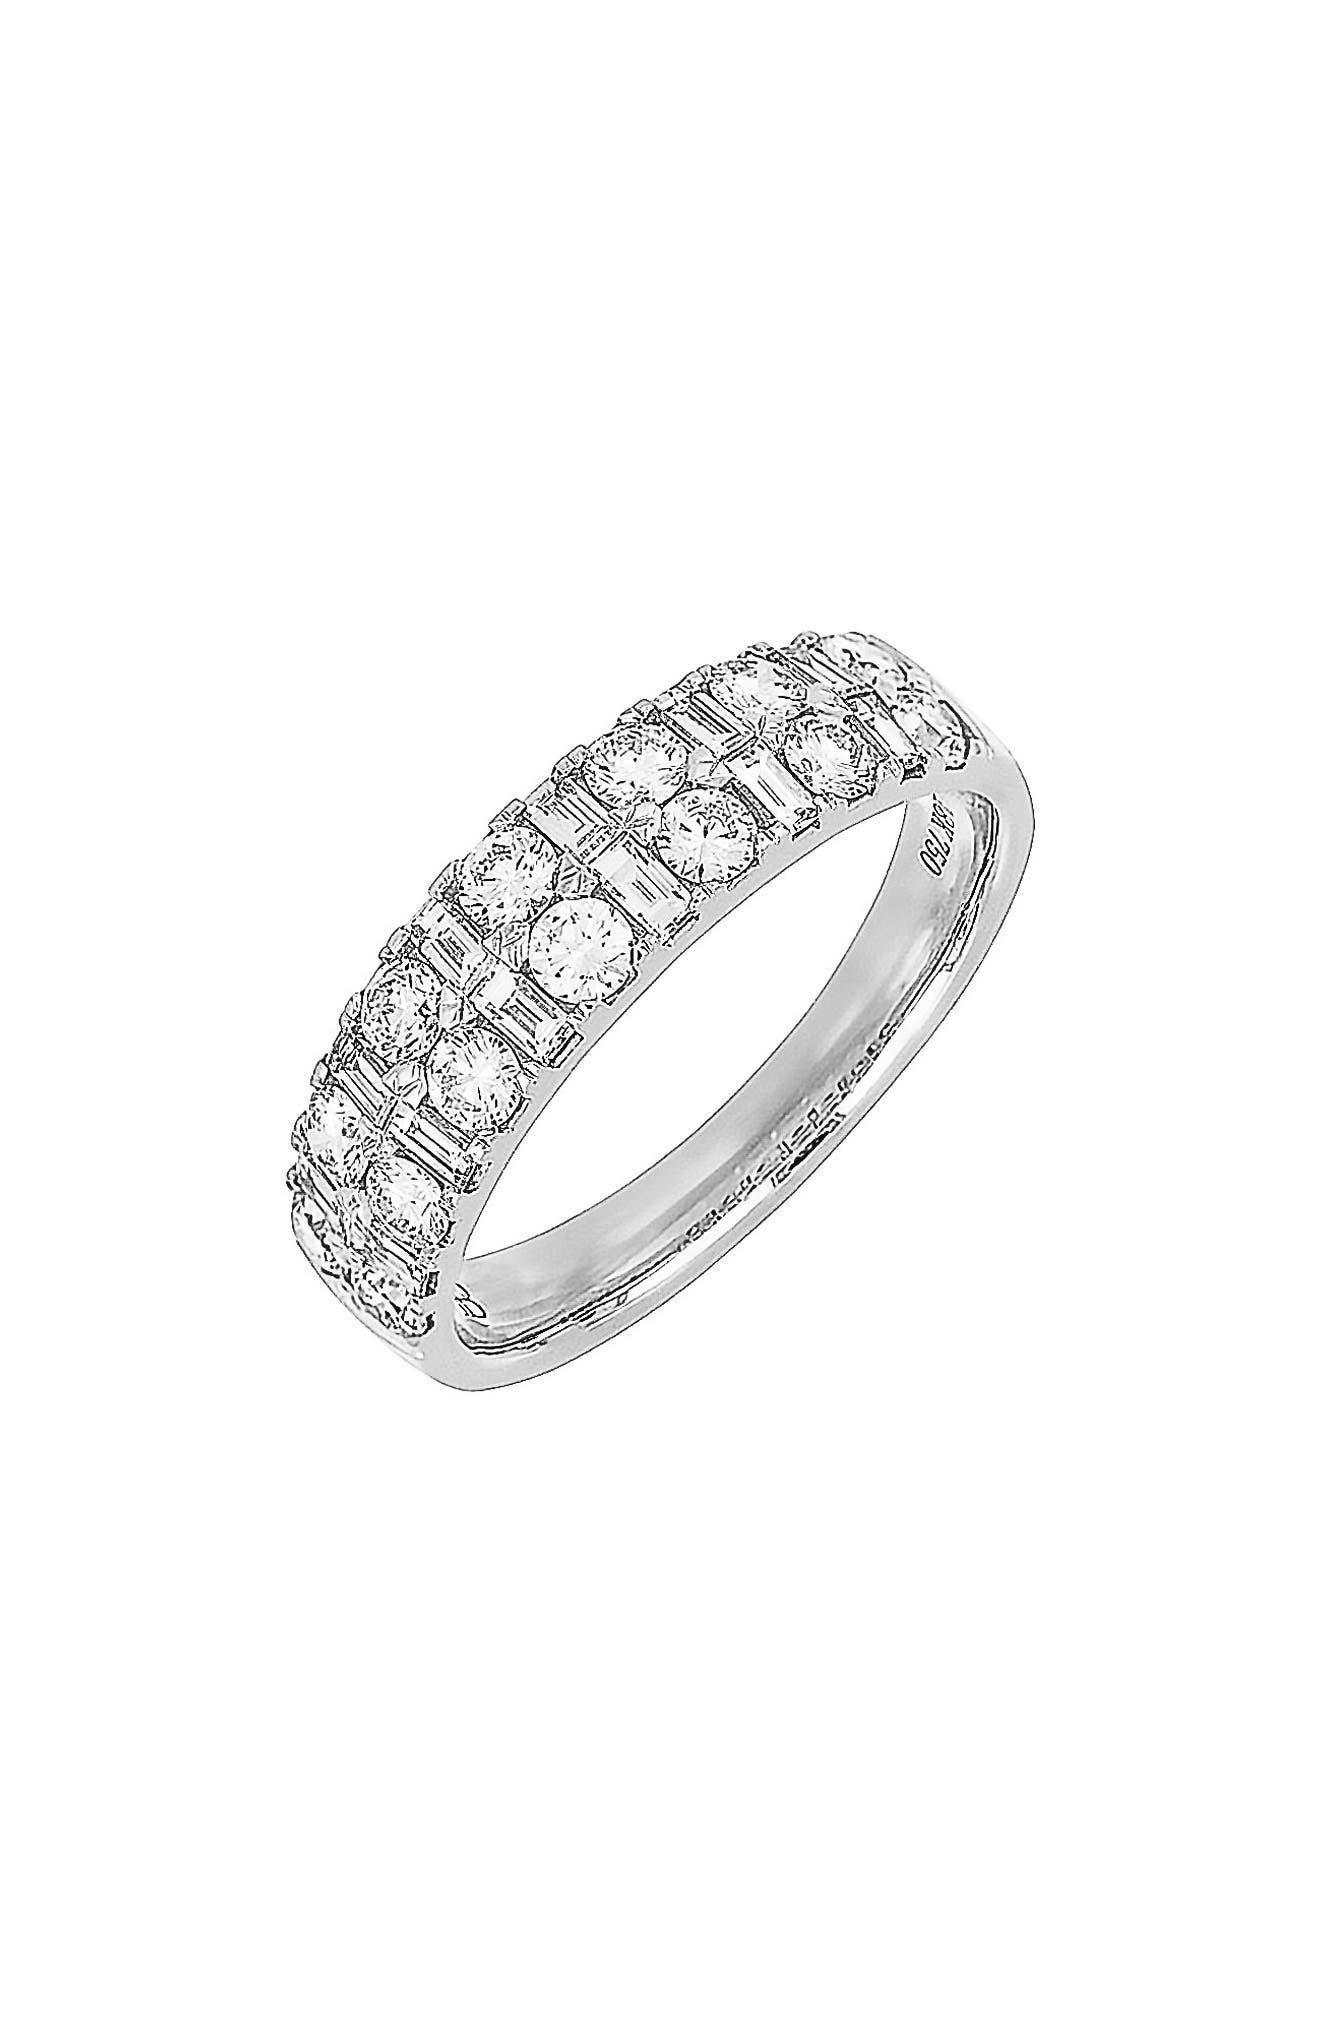 Kiera Multi Shape Diamond Ring,                         Main,                         color, White Gold